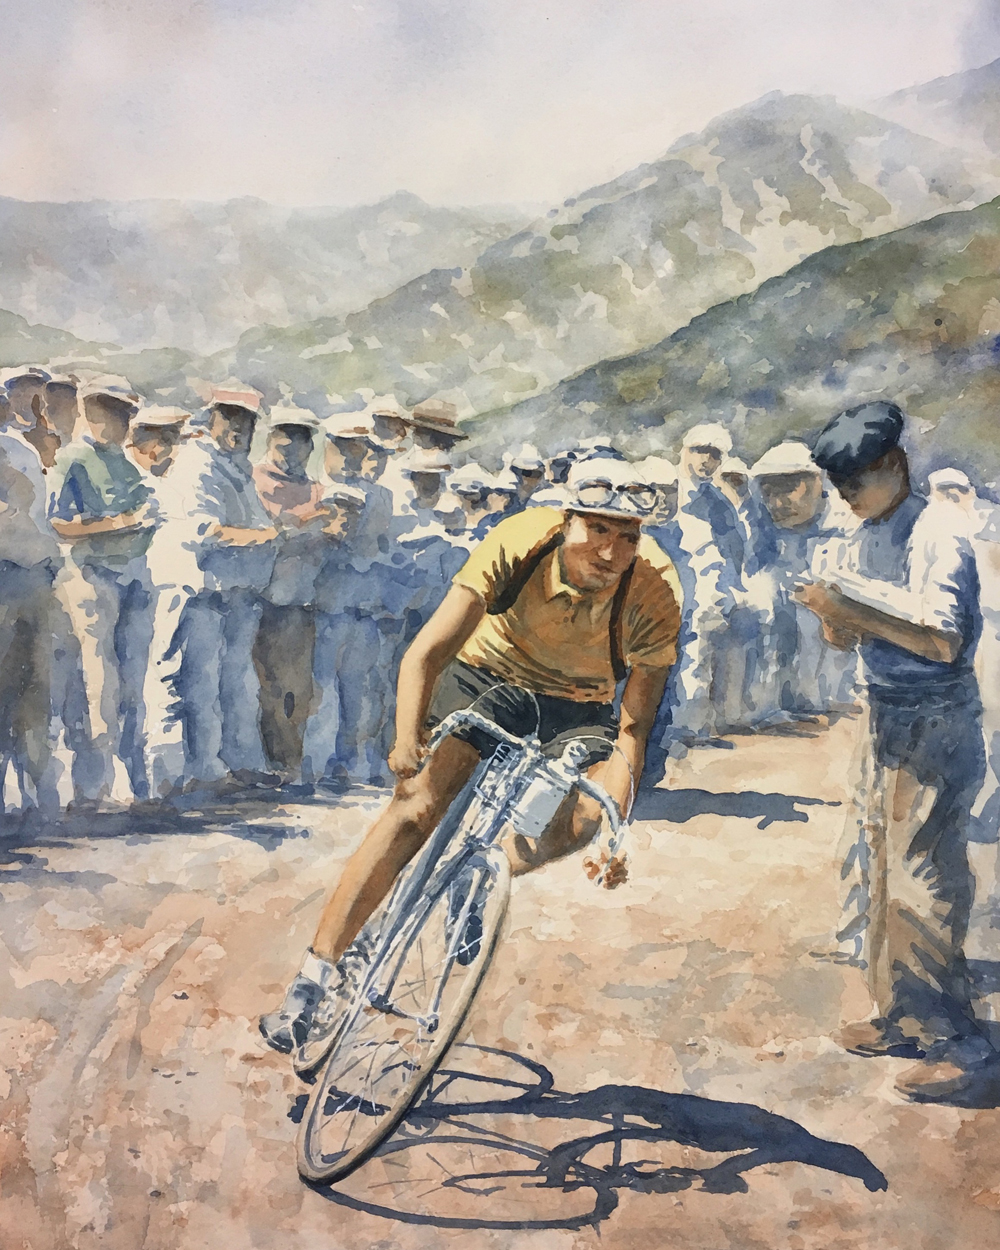 Title: Gino Bartali - 1938 Tour de France Medium: Watercolor on paper.